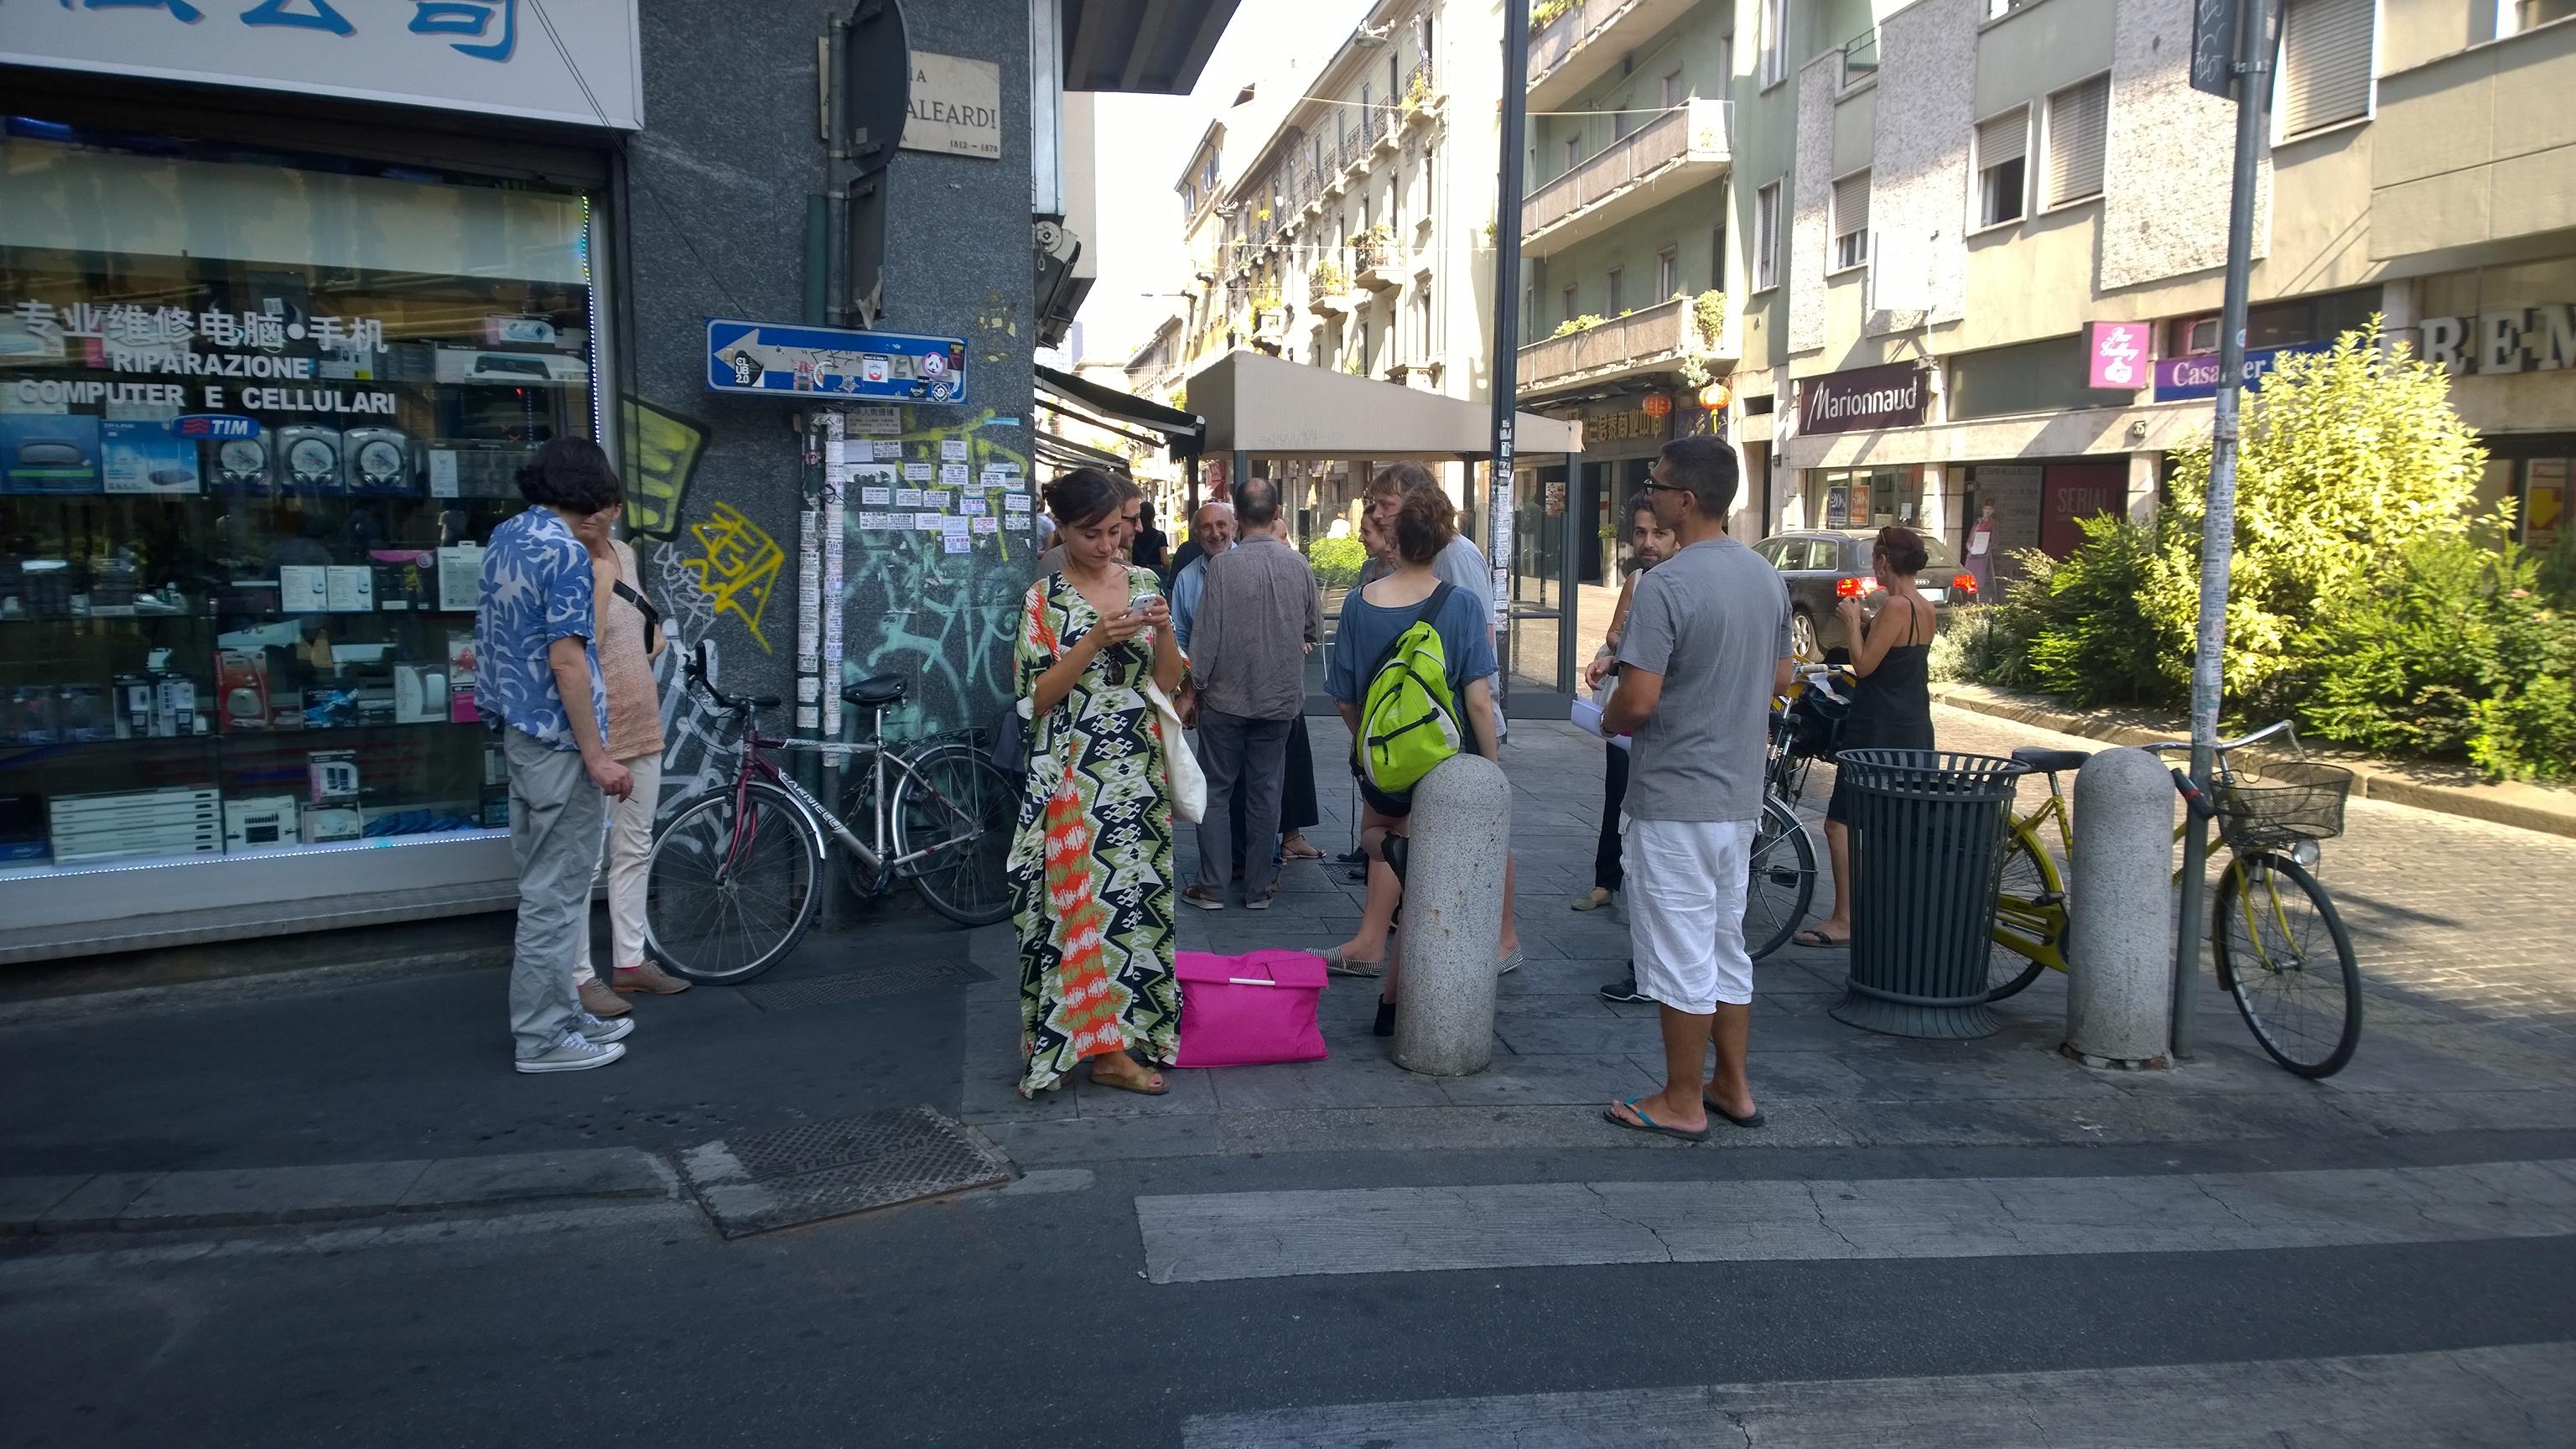 meeting point-Via Aleardi/Paolo Sarpi